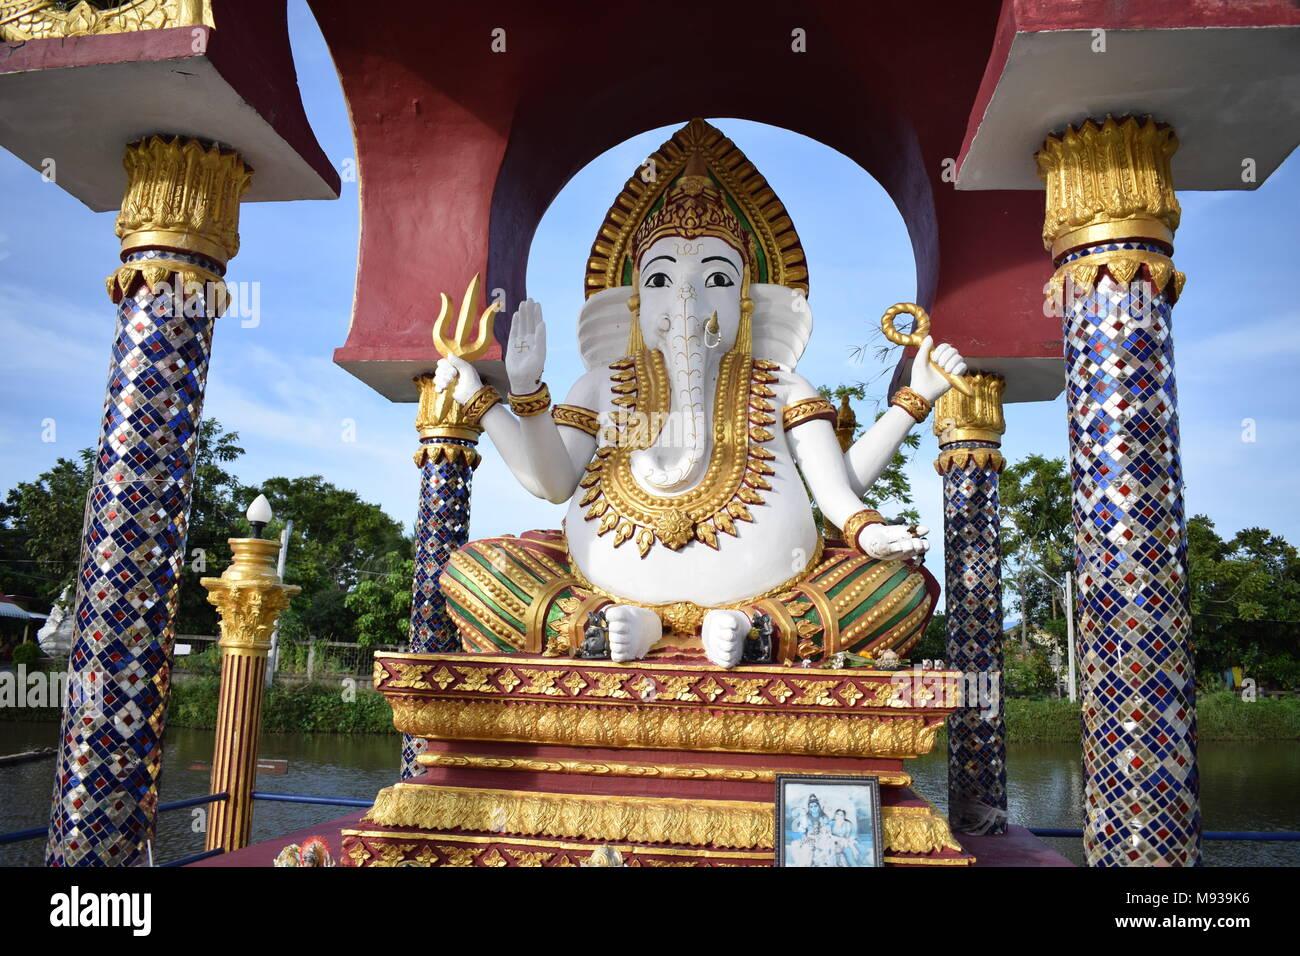 Ganesh Trompe A Droite ganesha elephant photos & ganesha elephant images - alamy